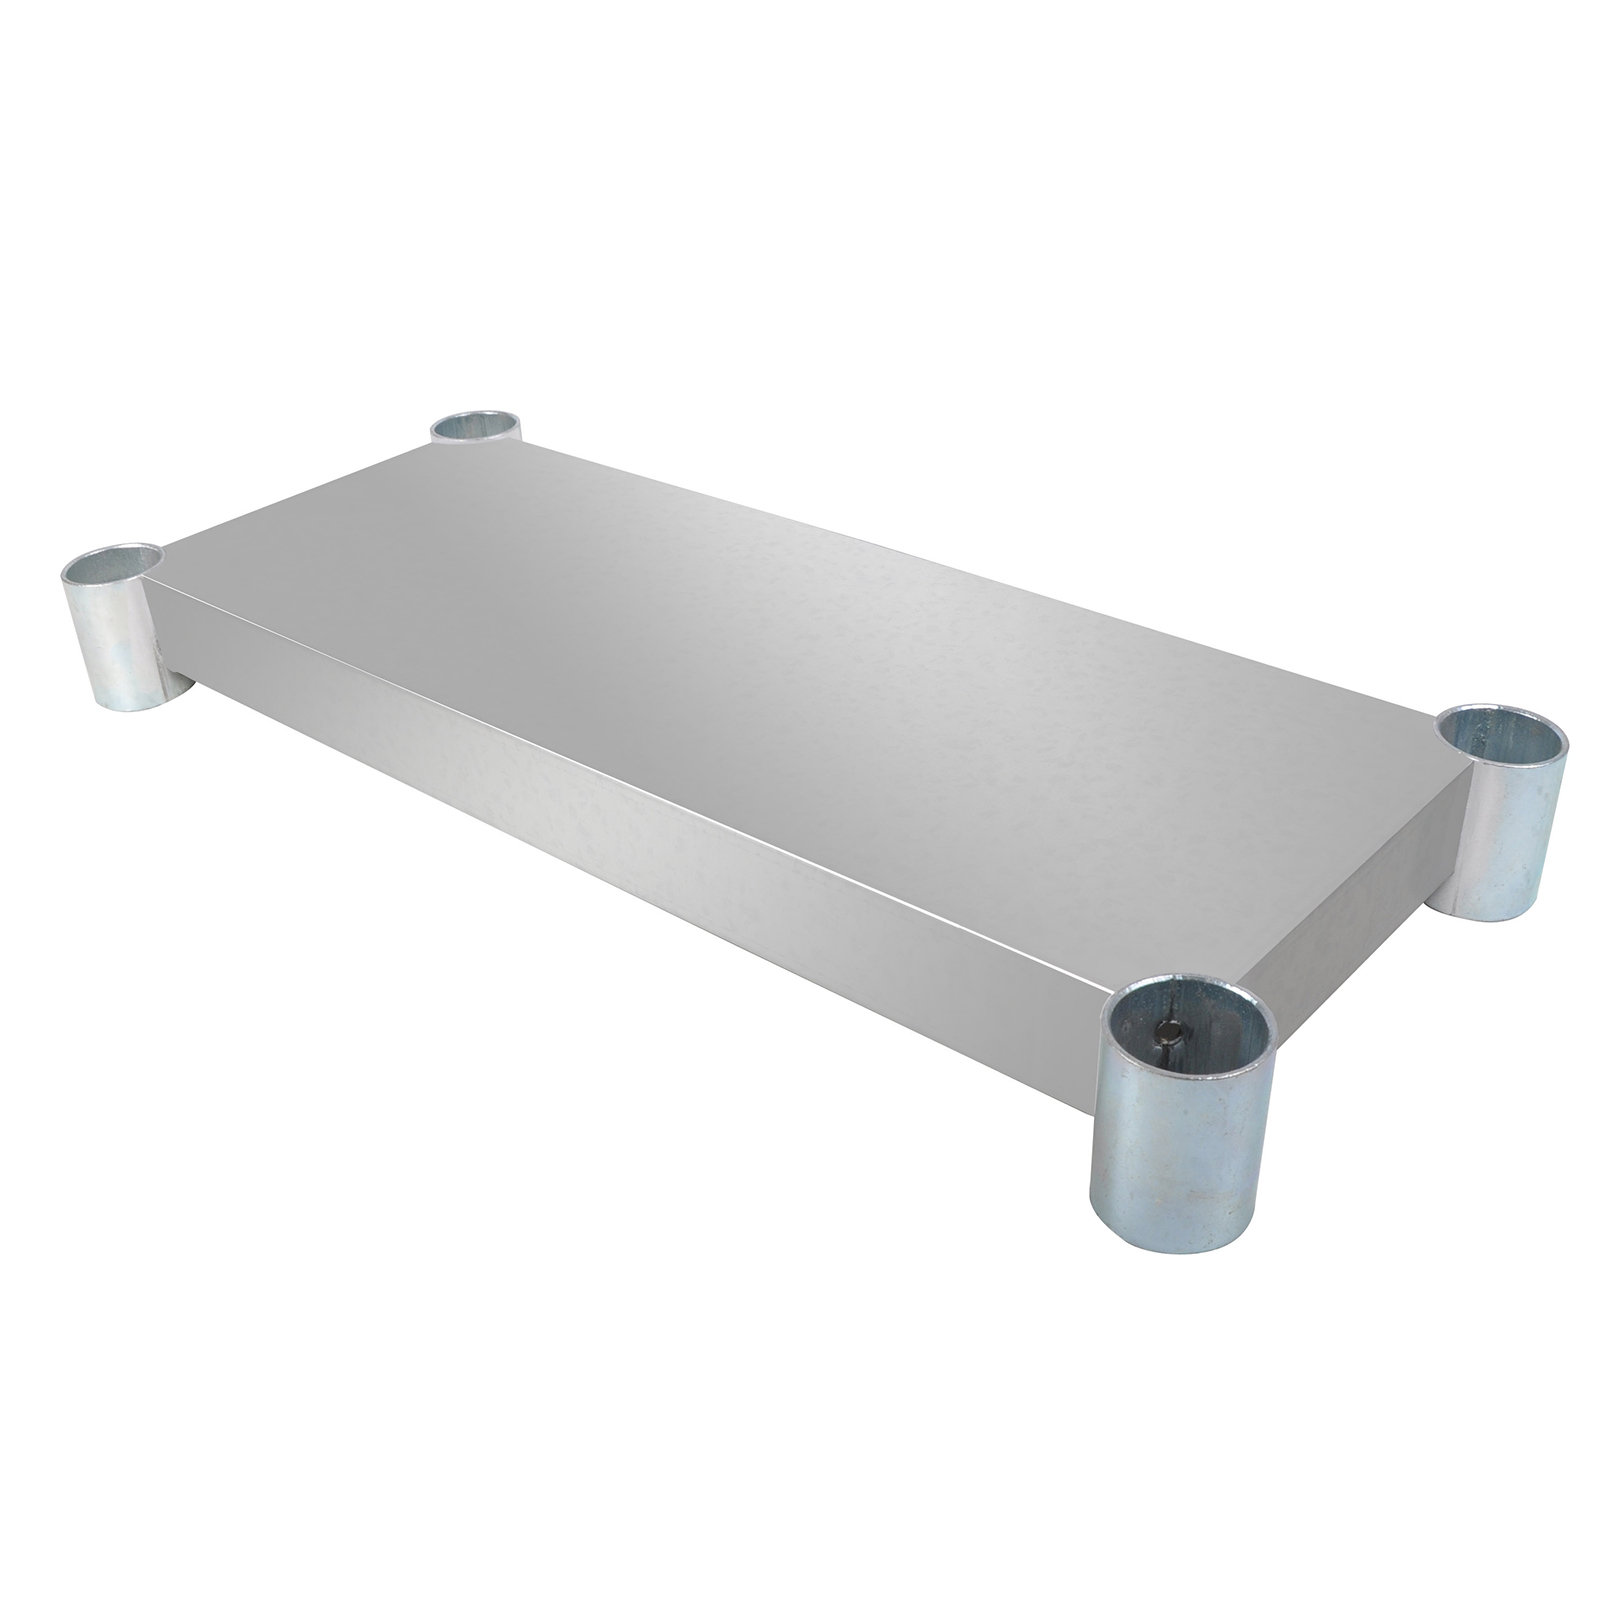 BK Resources SVTS-3624 work table, undershelf